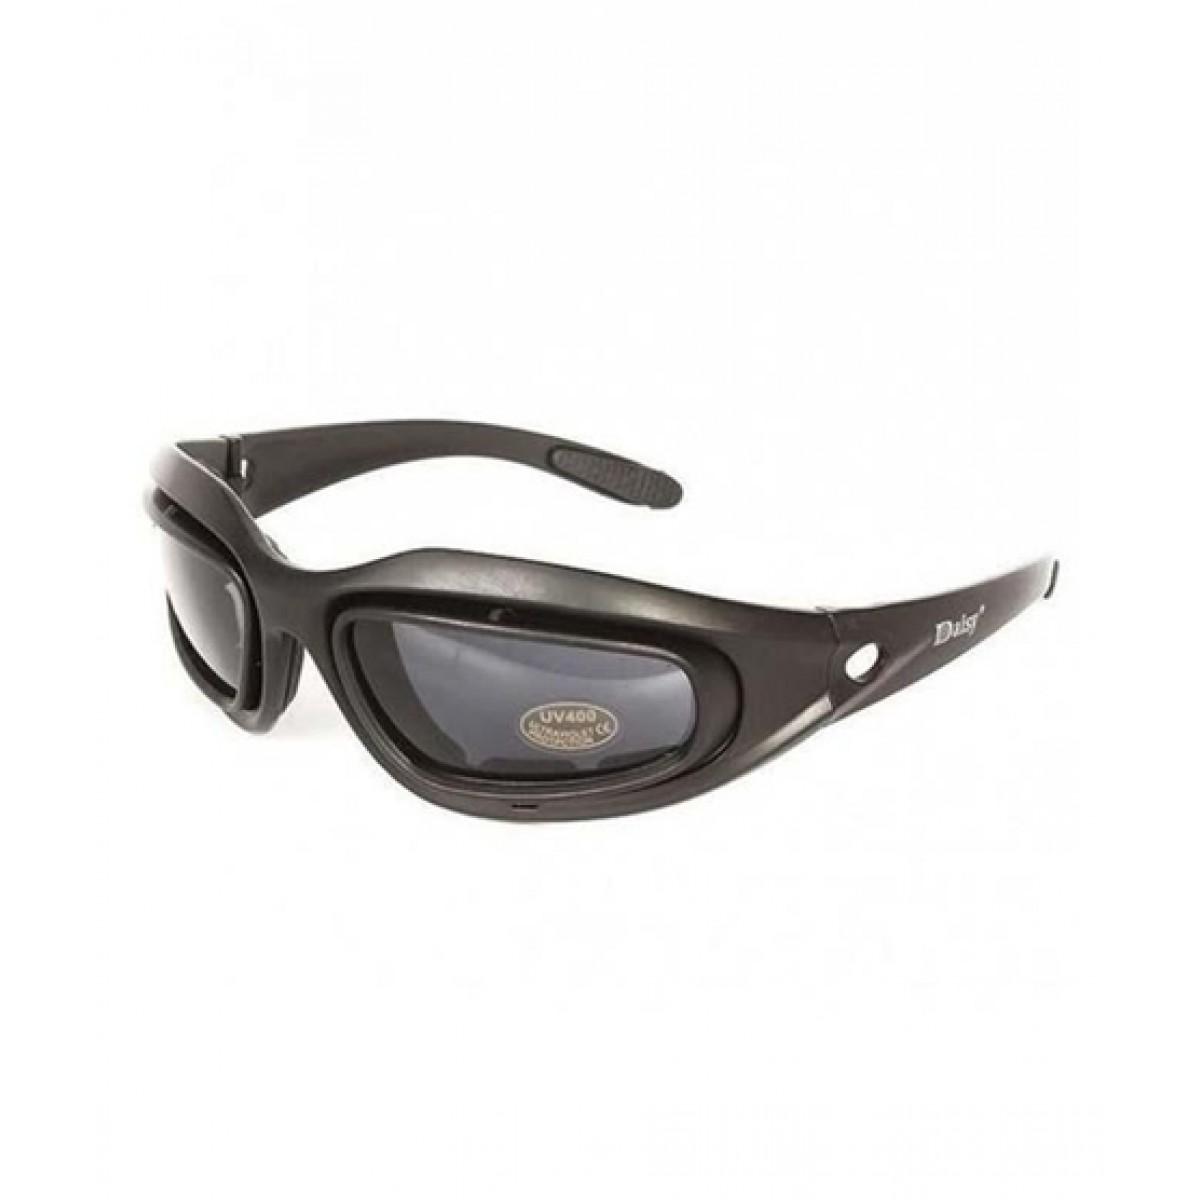 SYC Polarized Army Goggles 4 Lens Kit